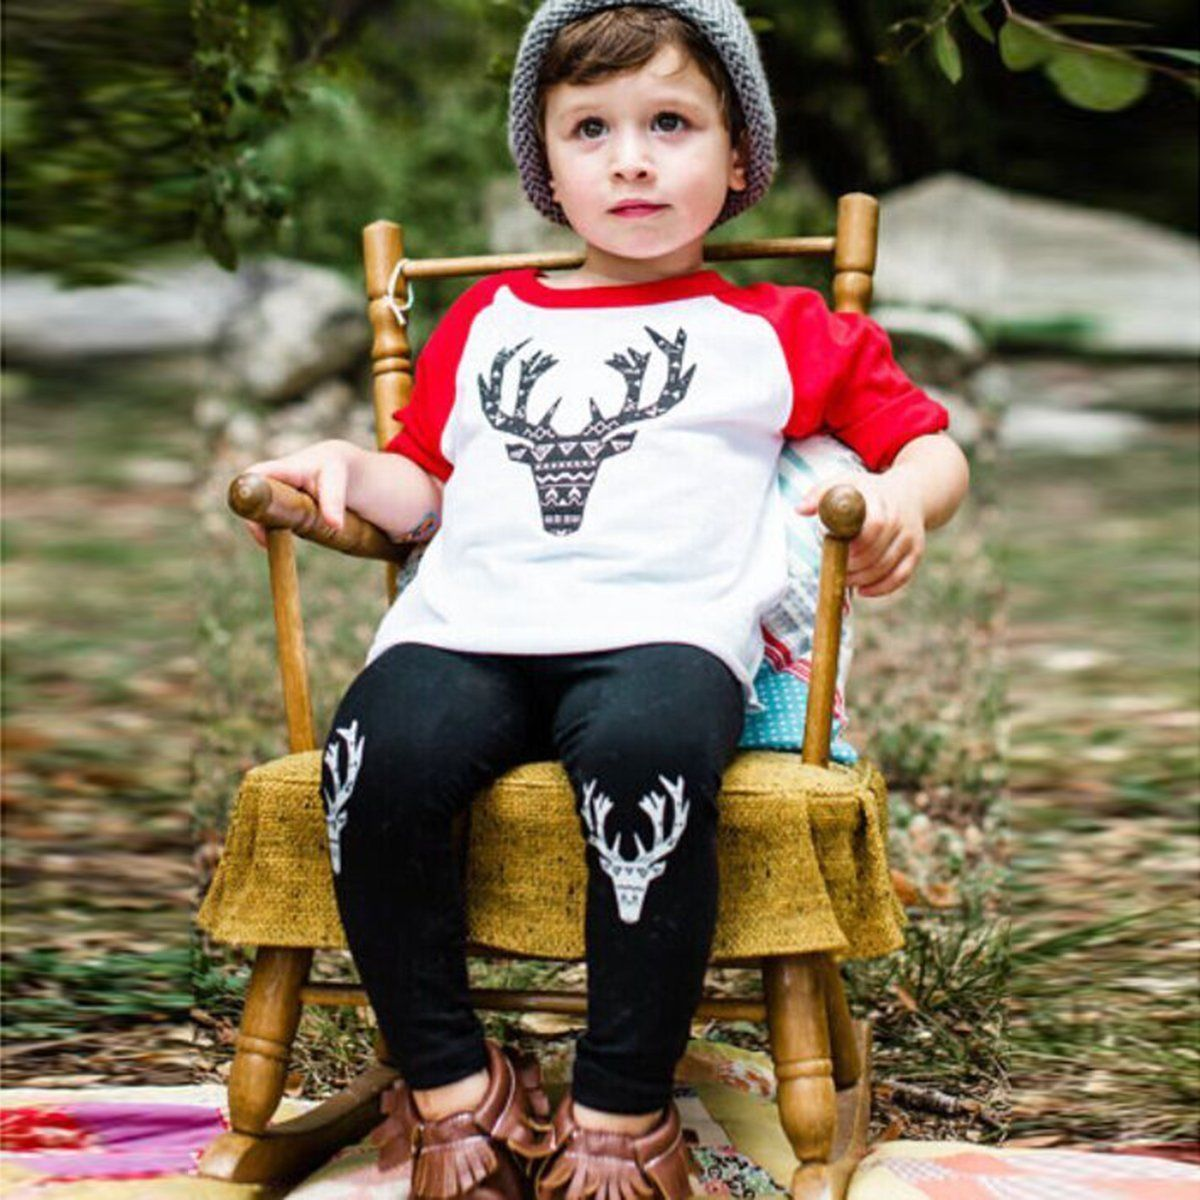 Puseky Baby Full Clothing Sets 2pcs Toddler Kids Baby Boy T shirt Tops Long Pants Trousers